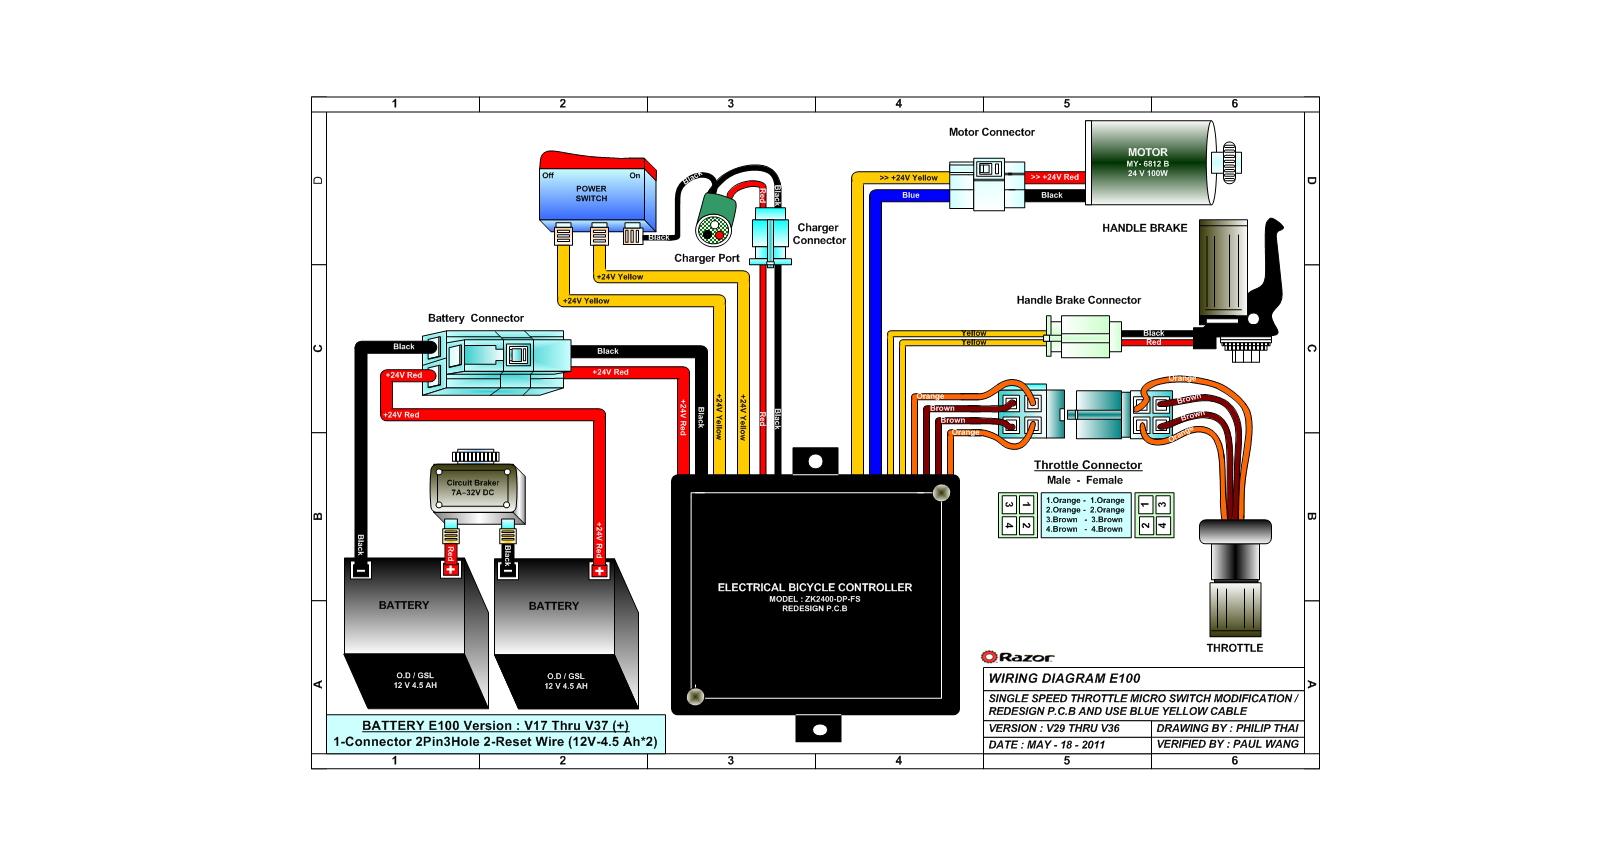 e100 v29 v36 wiring diagram?resize\\=665%2C359 100 [ gmc t6500 repair manual ] chevrolet box van truck for 2000 gmc t6500 wiring diagram at virtualis.co